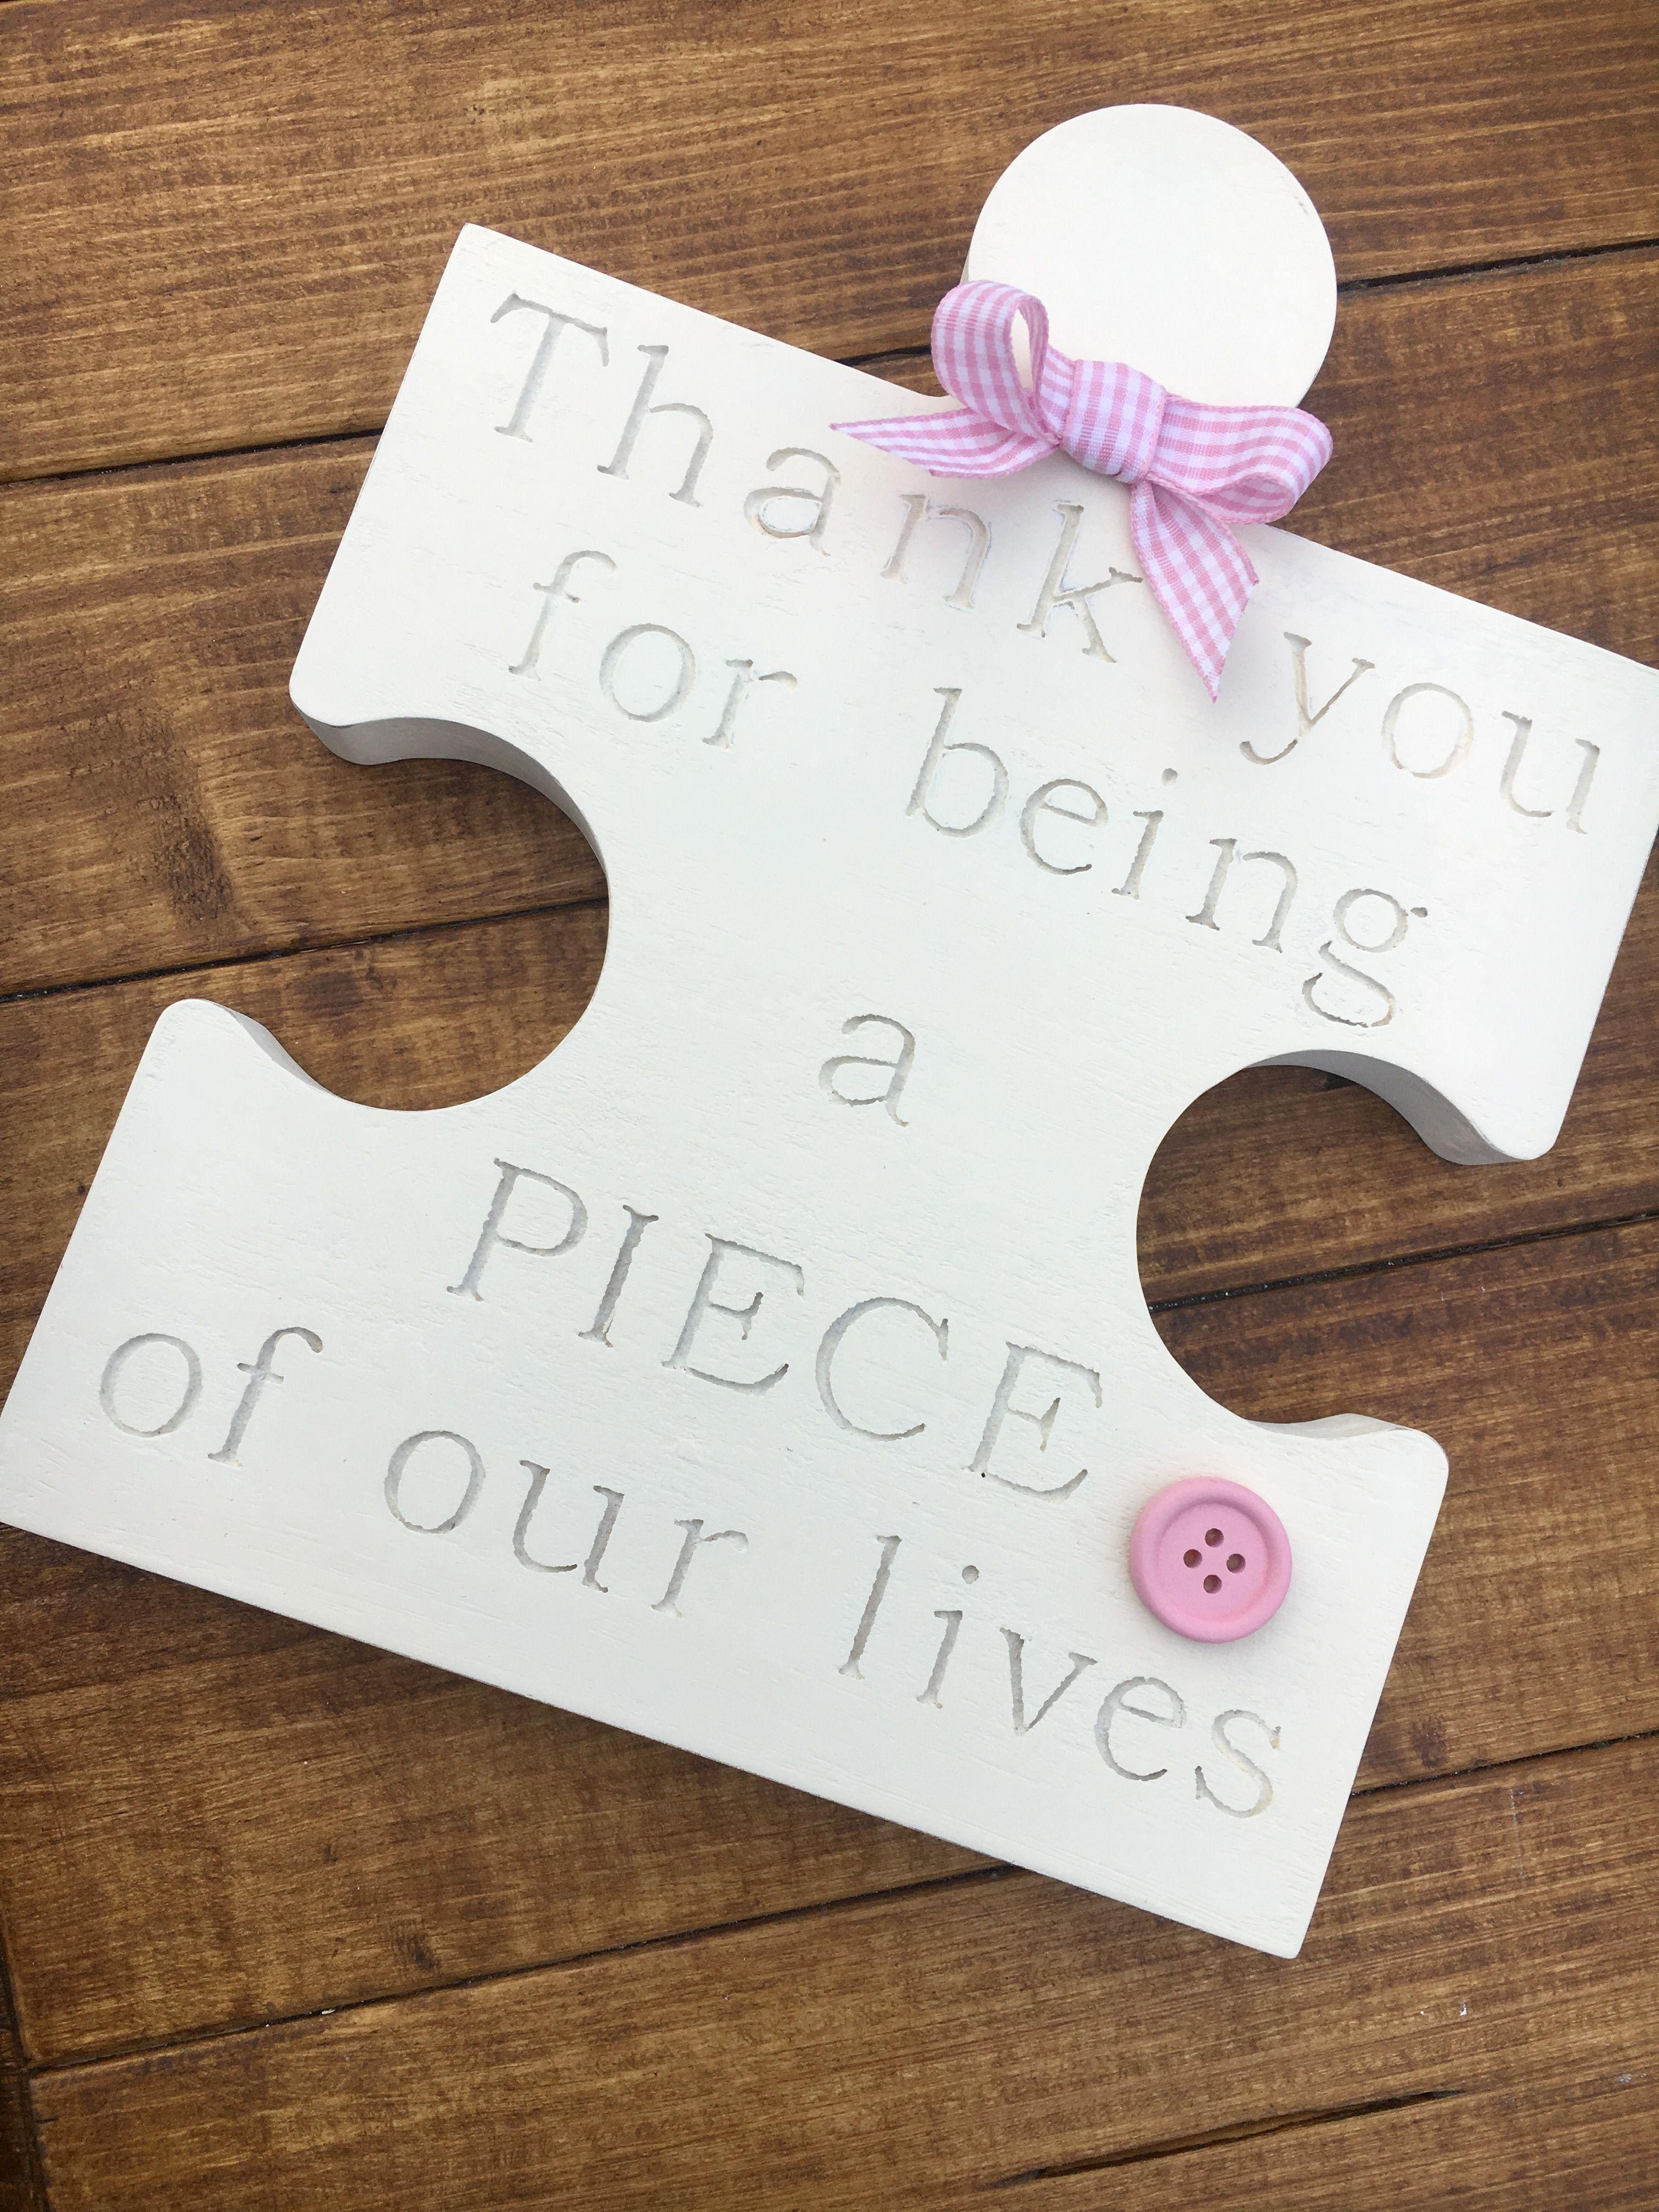 Goodbye Card Ideas Best Of Aishah Gustafson 1sttimemomma On Pinterest Goodbye Gifts Diy Teacher Gifts Farewell Gifts